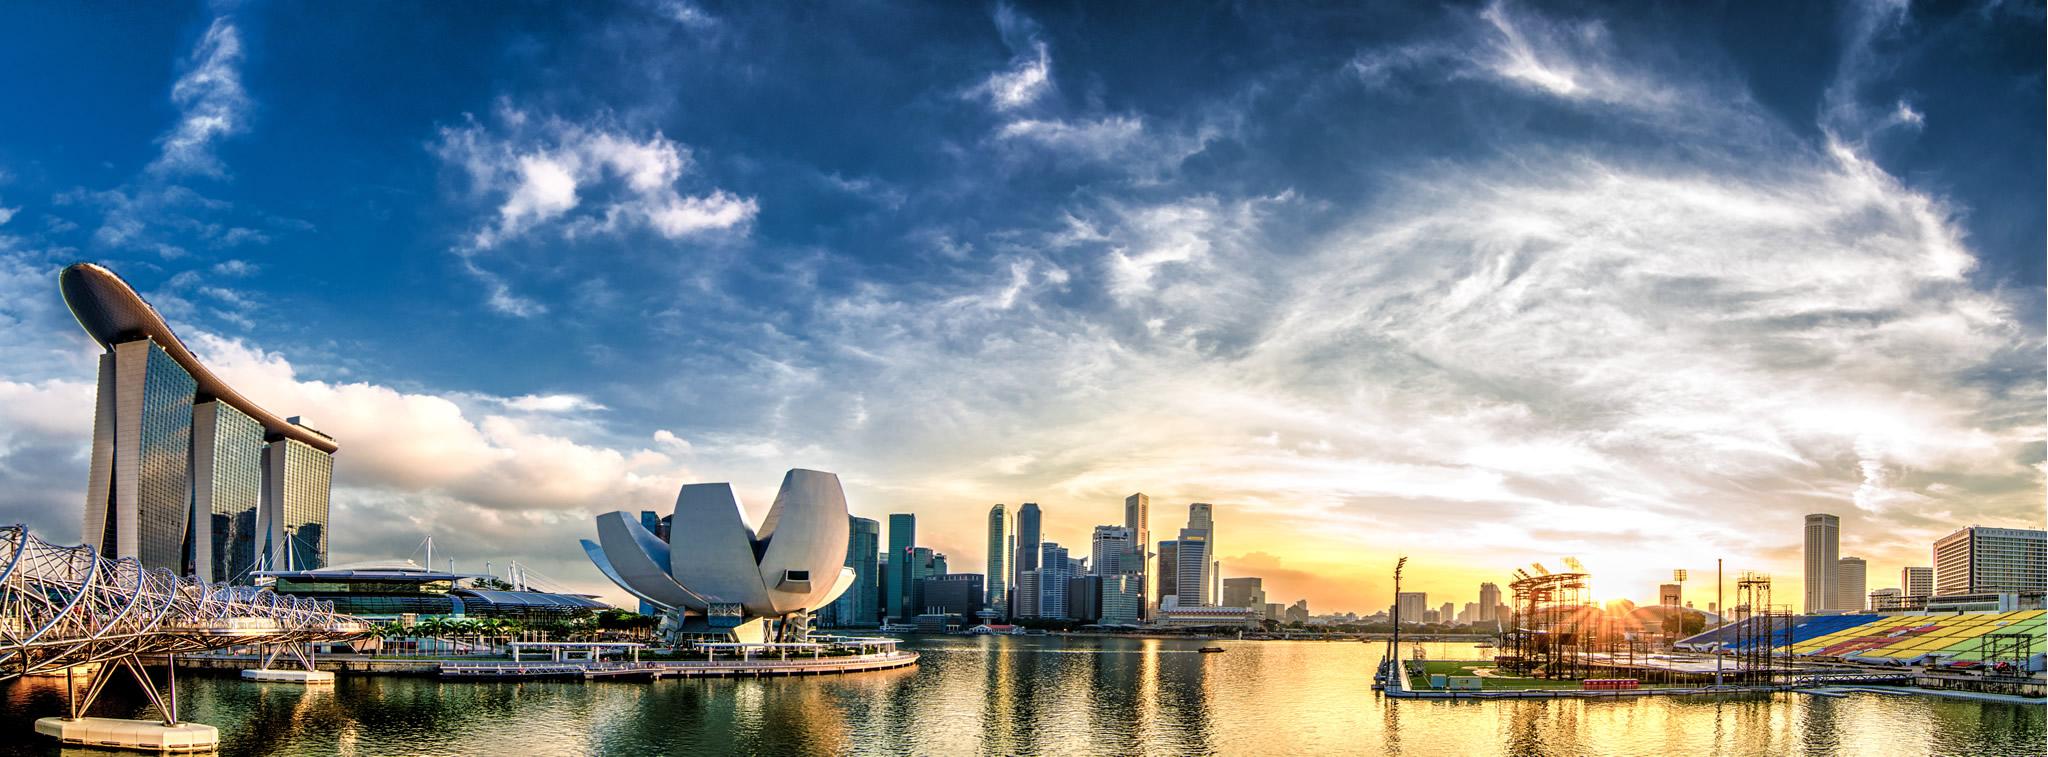 222wallpaper-singapore-2